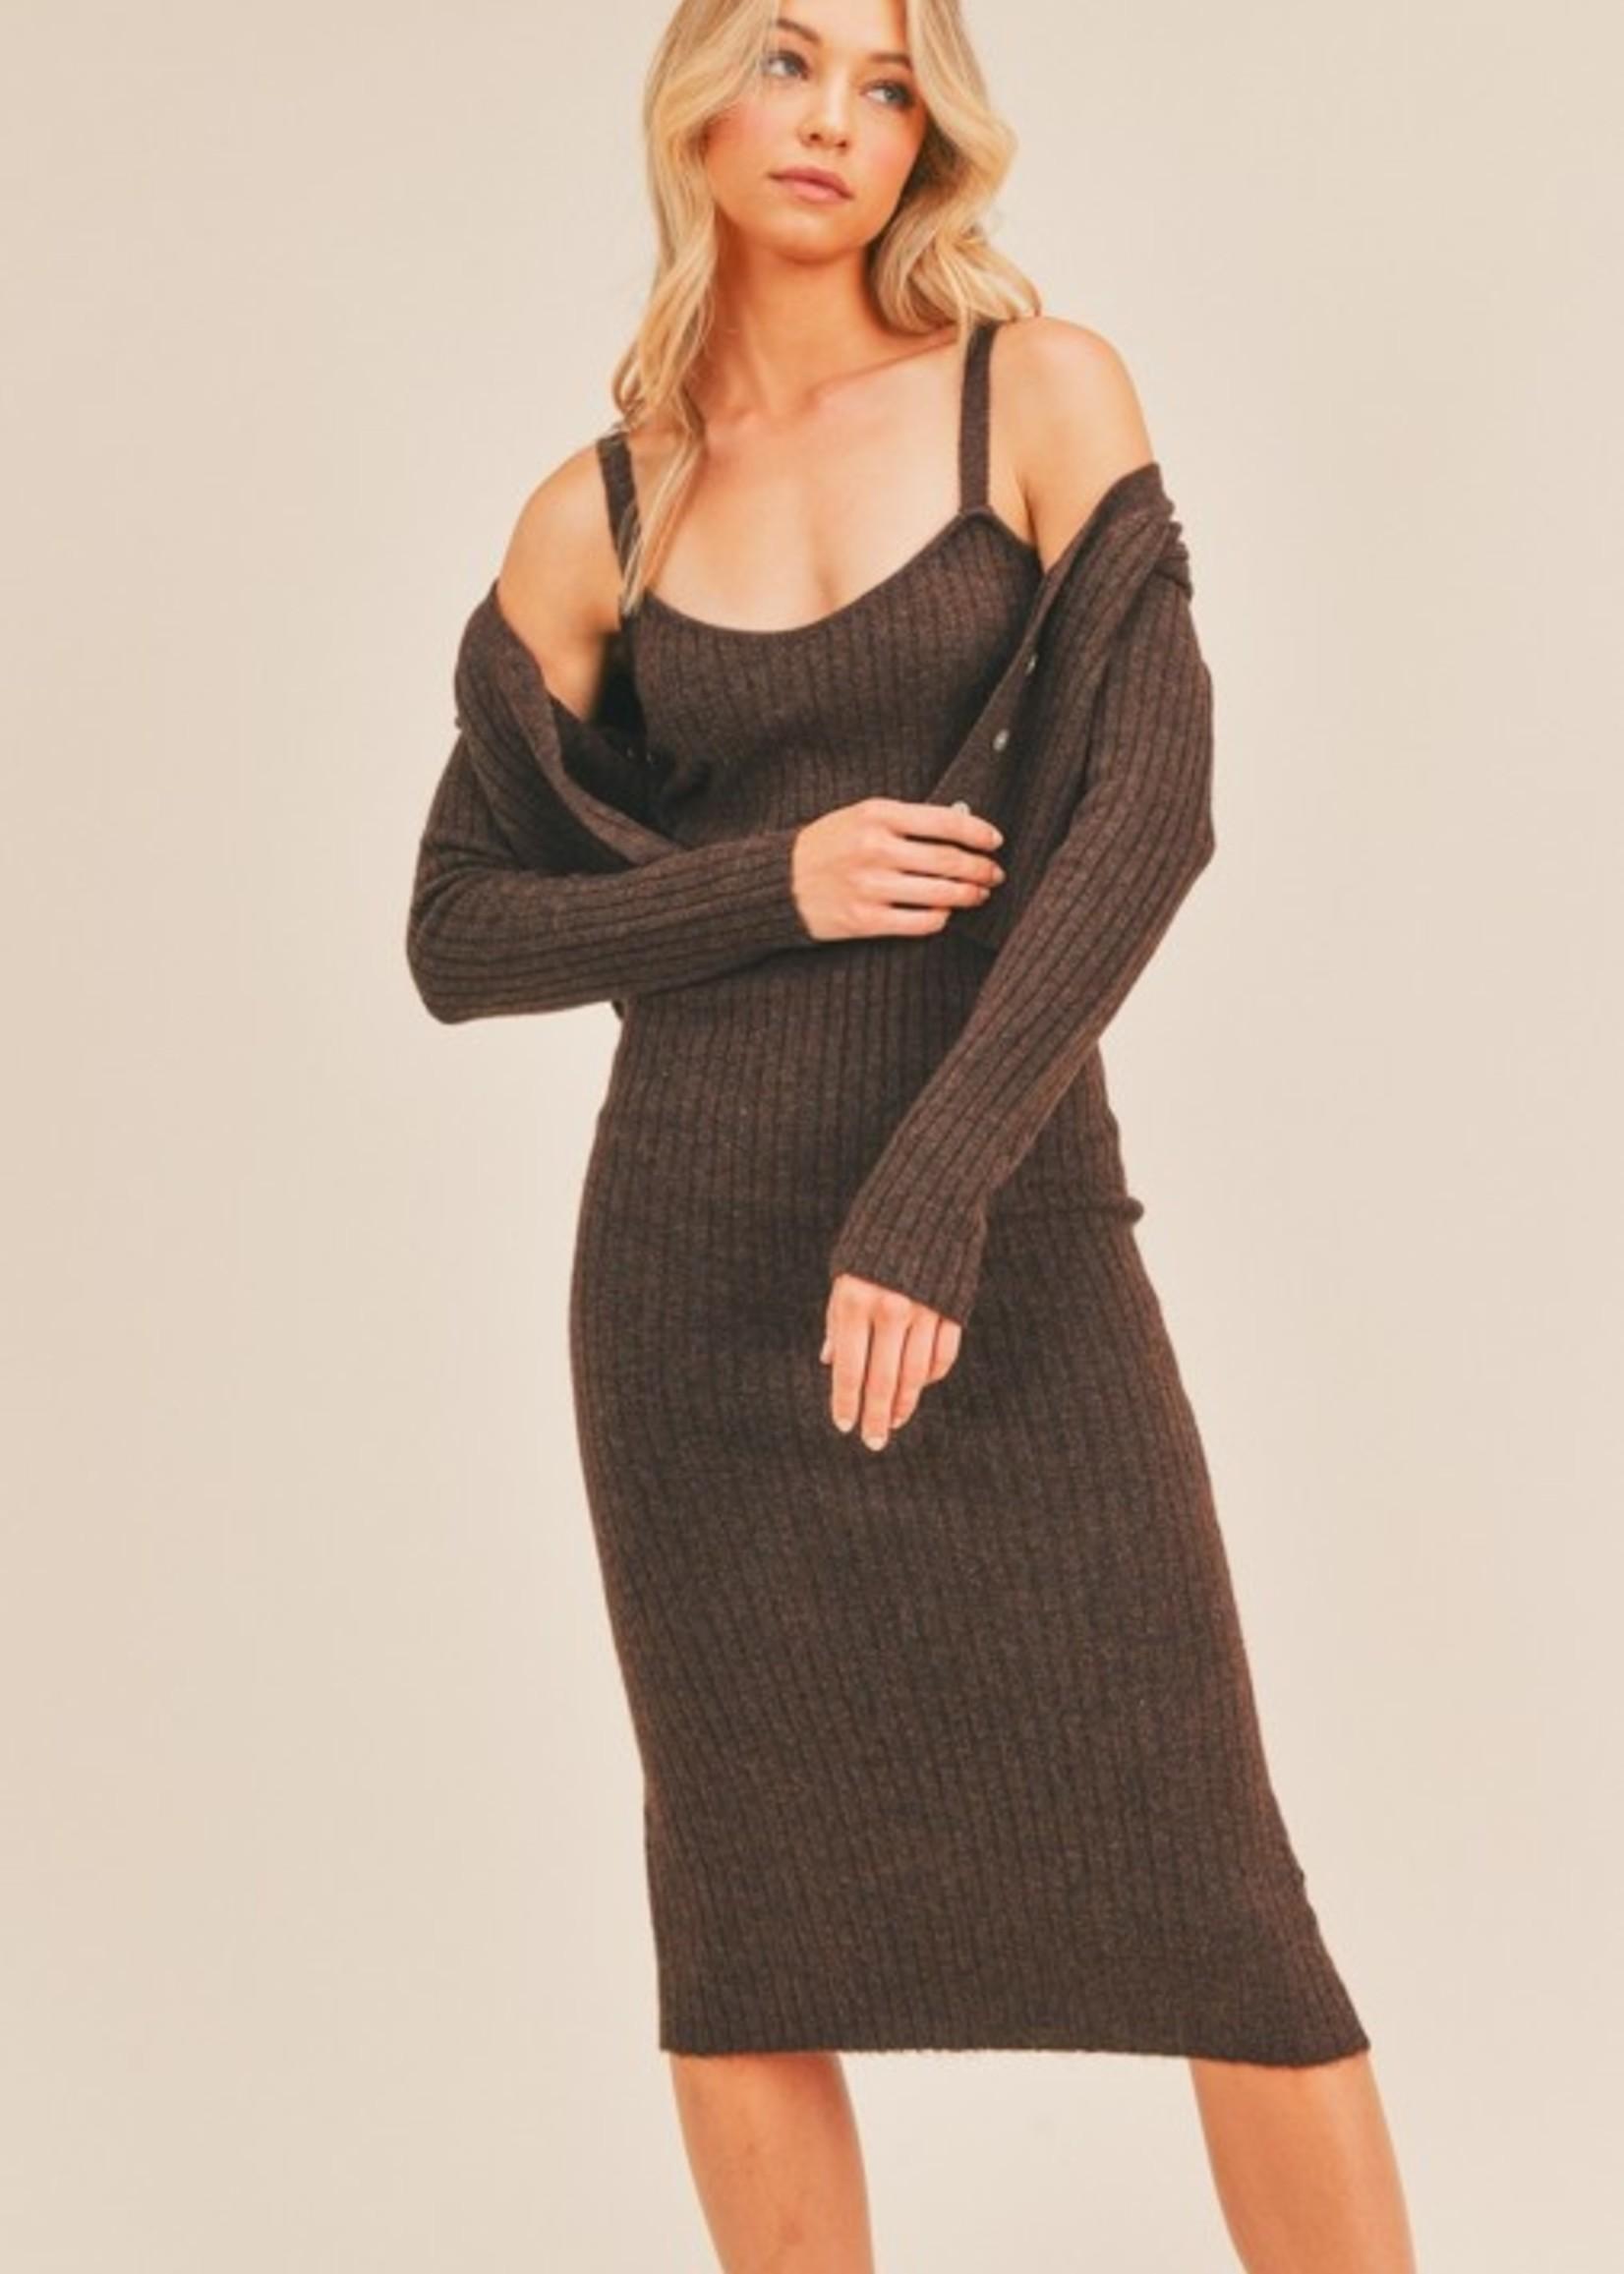 Lush Ribbed Dress & Cardigan Set - Brunette